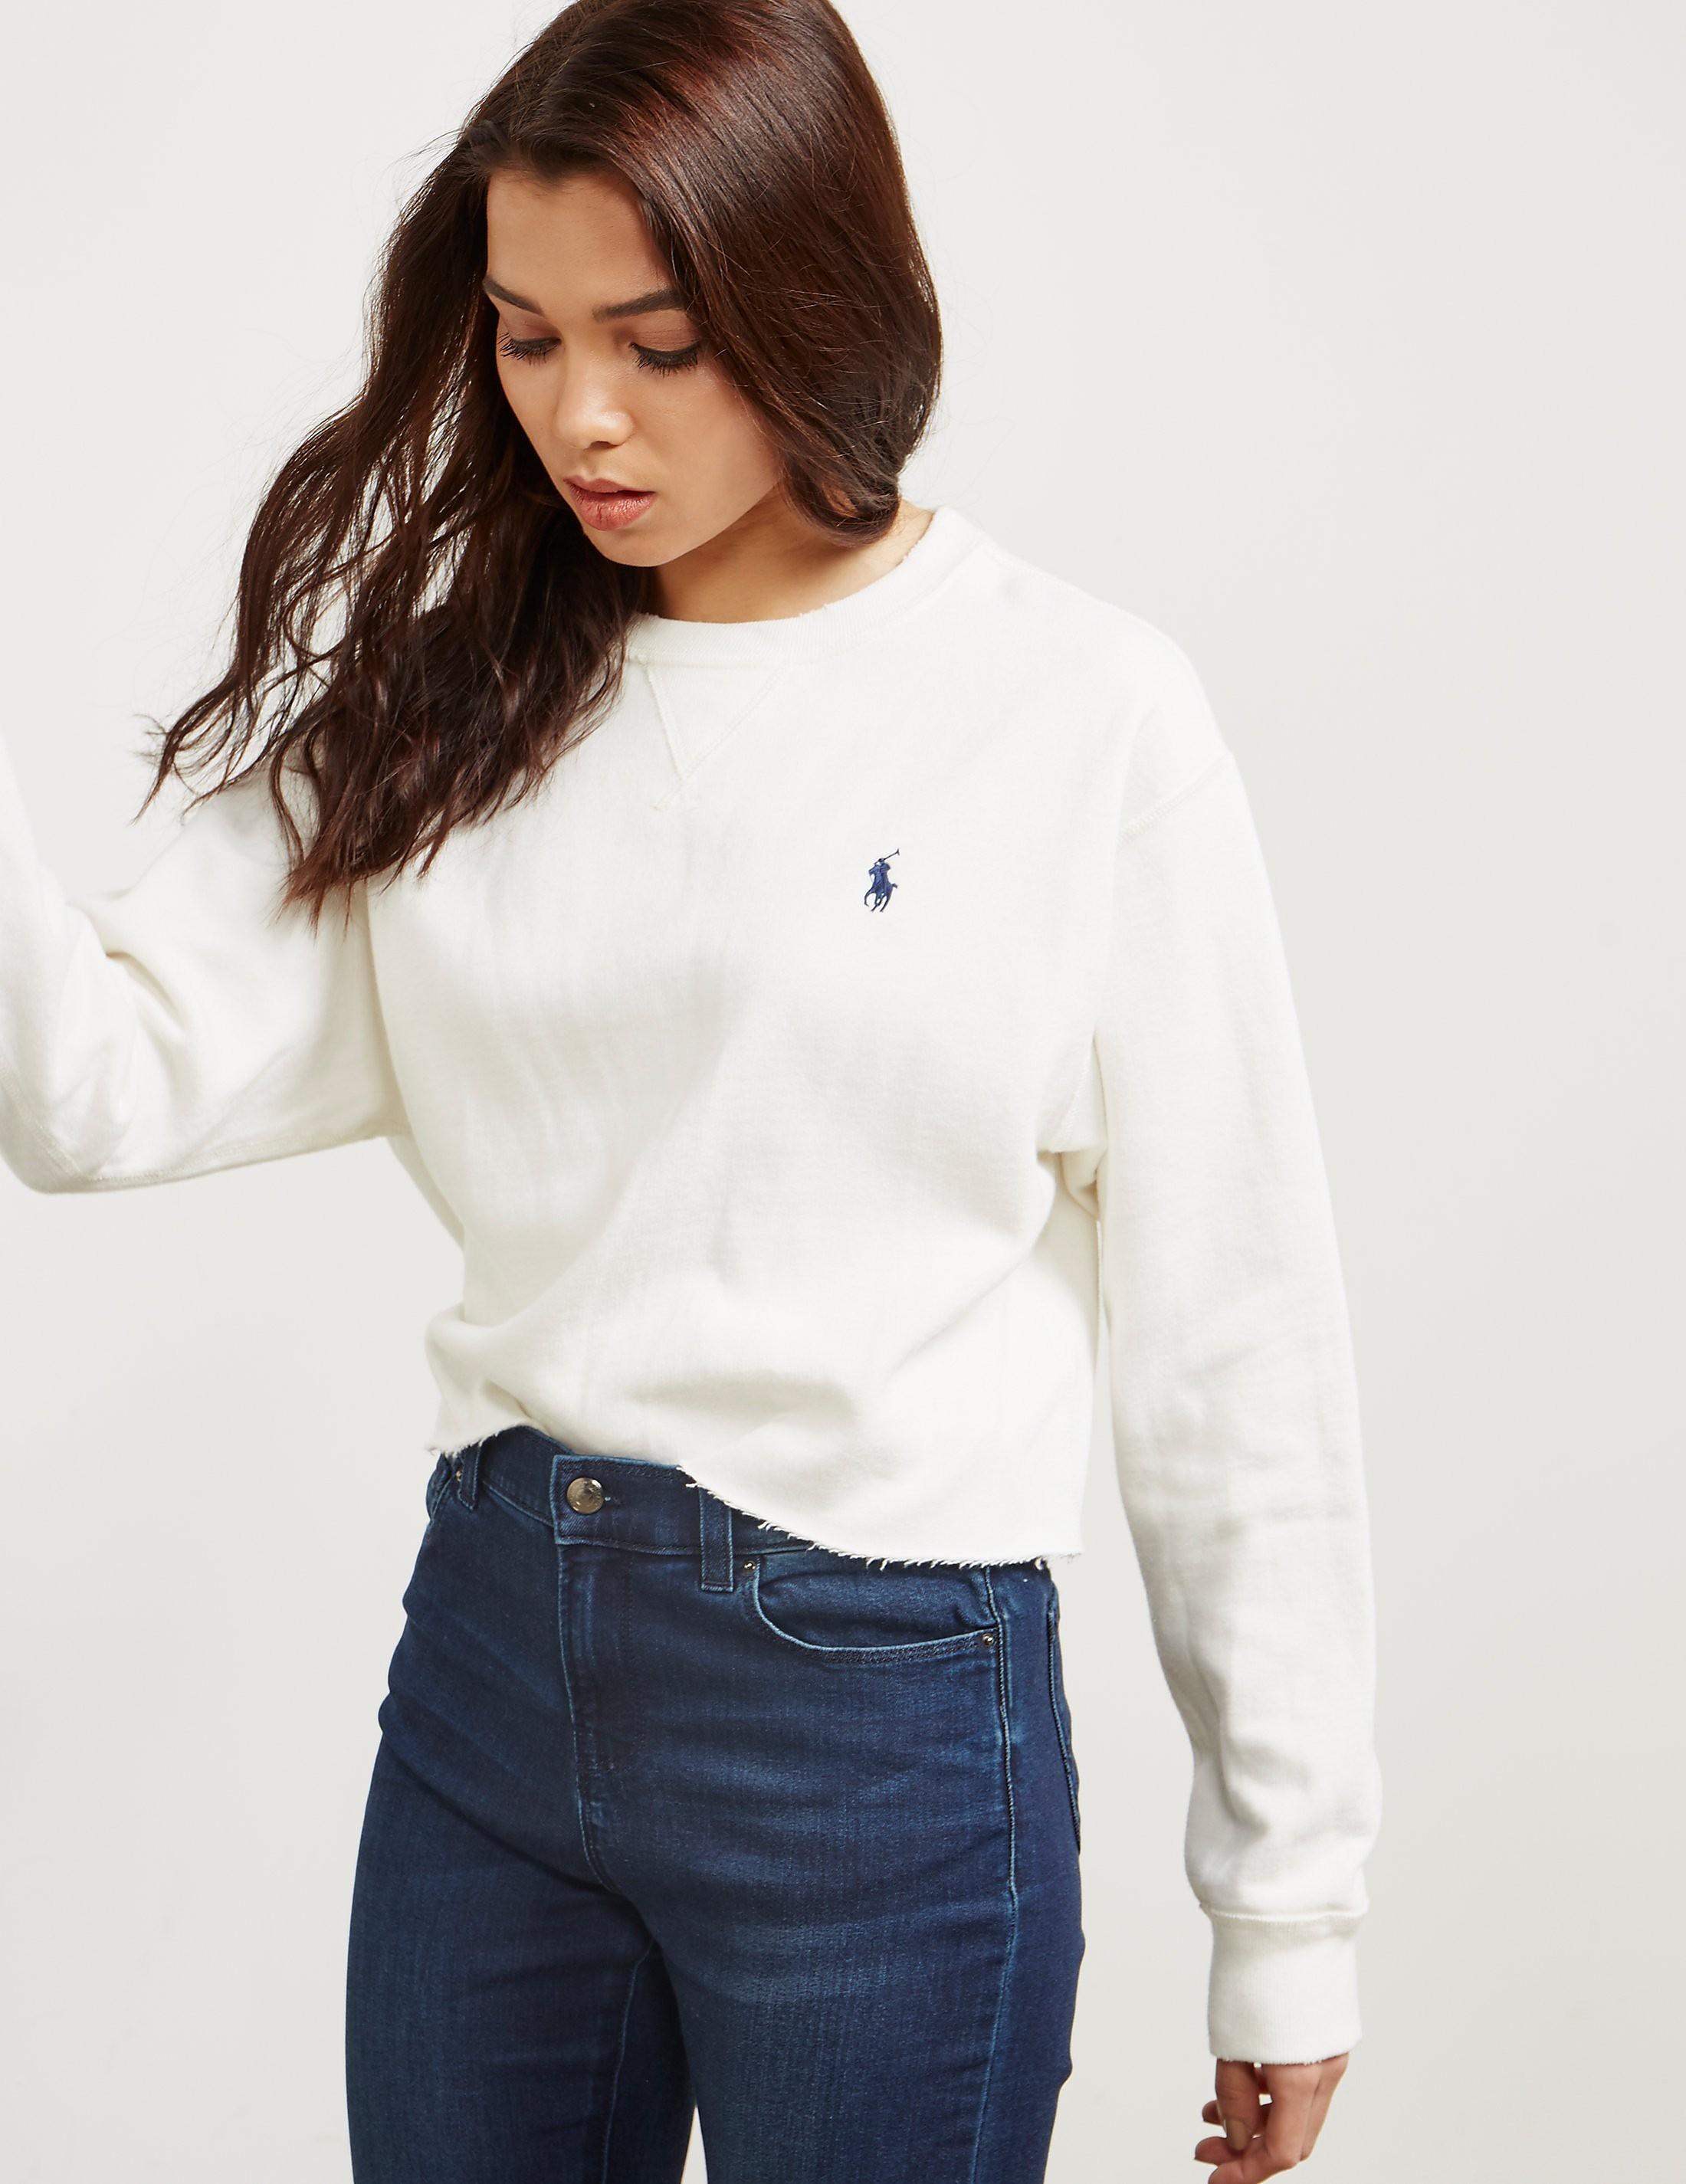 Polo Ralph Lauren Cropped Sweatshirt